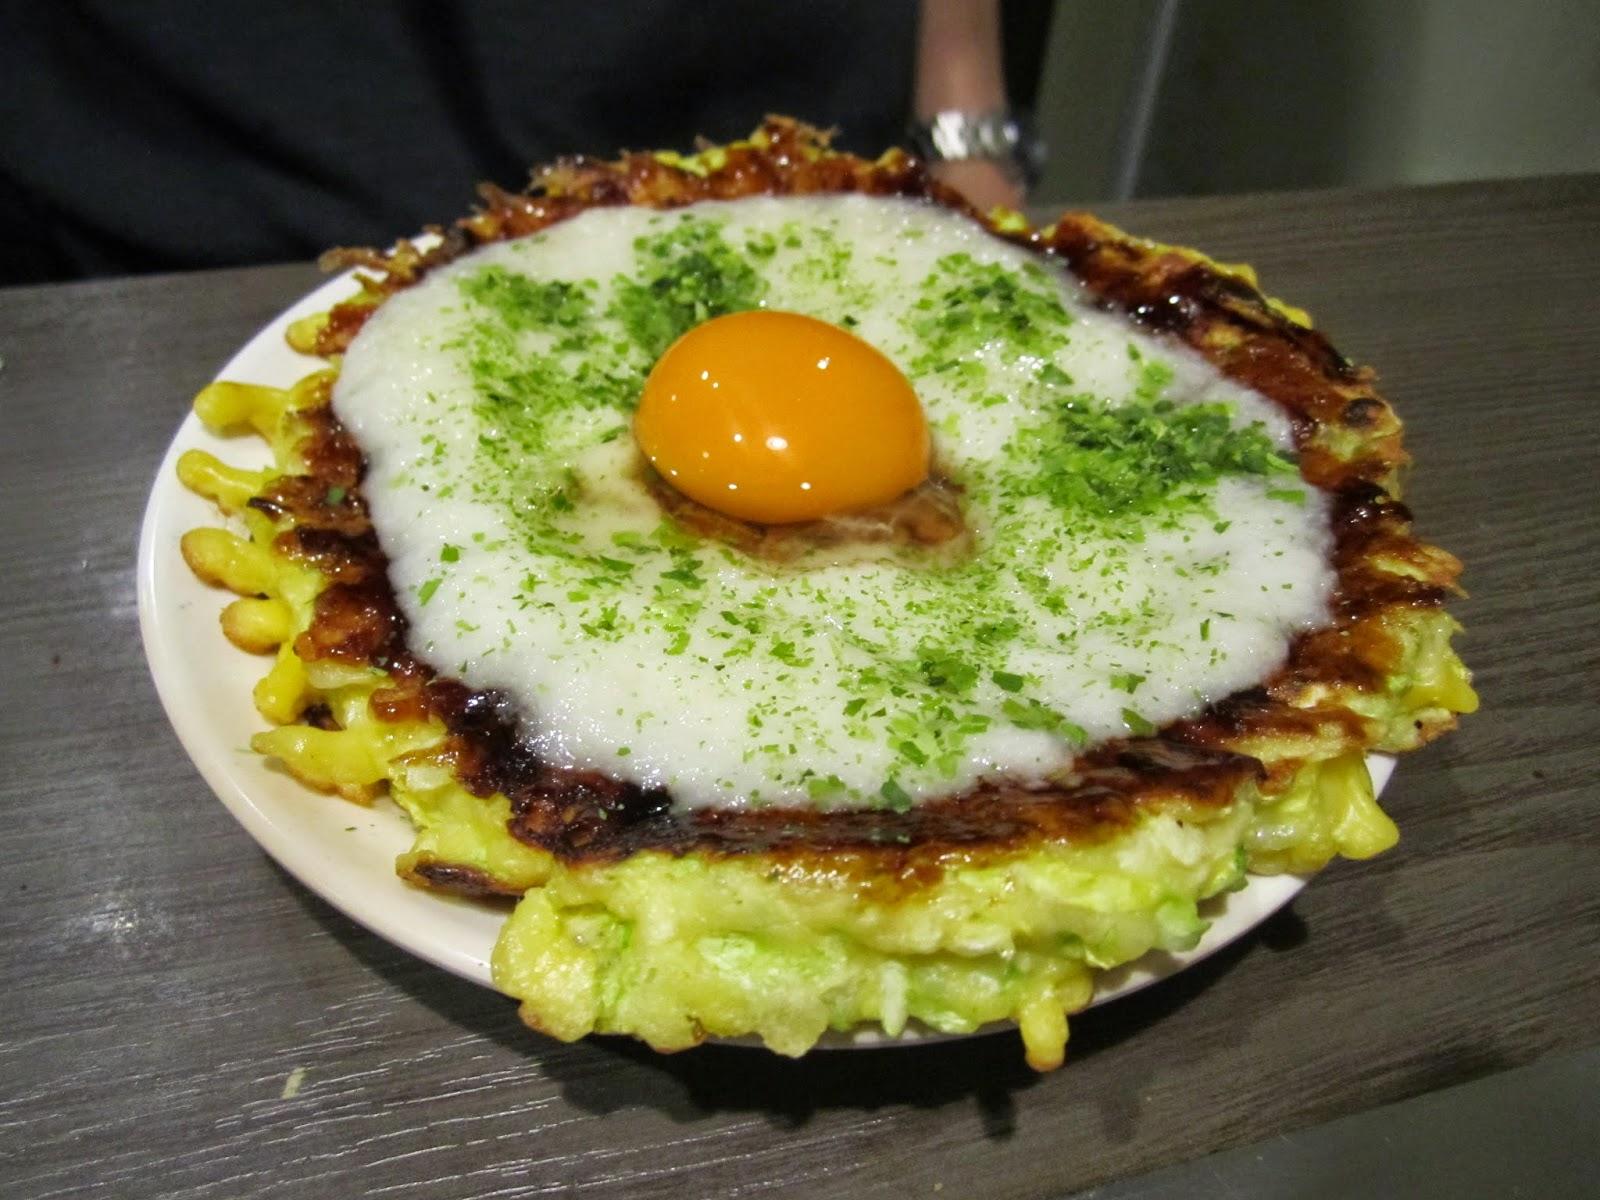 Gudetama x Dohtonbori Collaboration Campaign Okonomiyaki 十和田市 ぐでたまx道頓堀コラブキャンペインお好み焼き